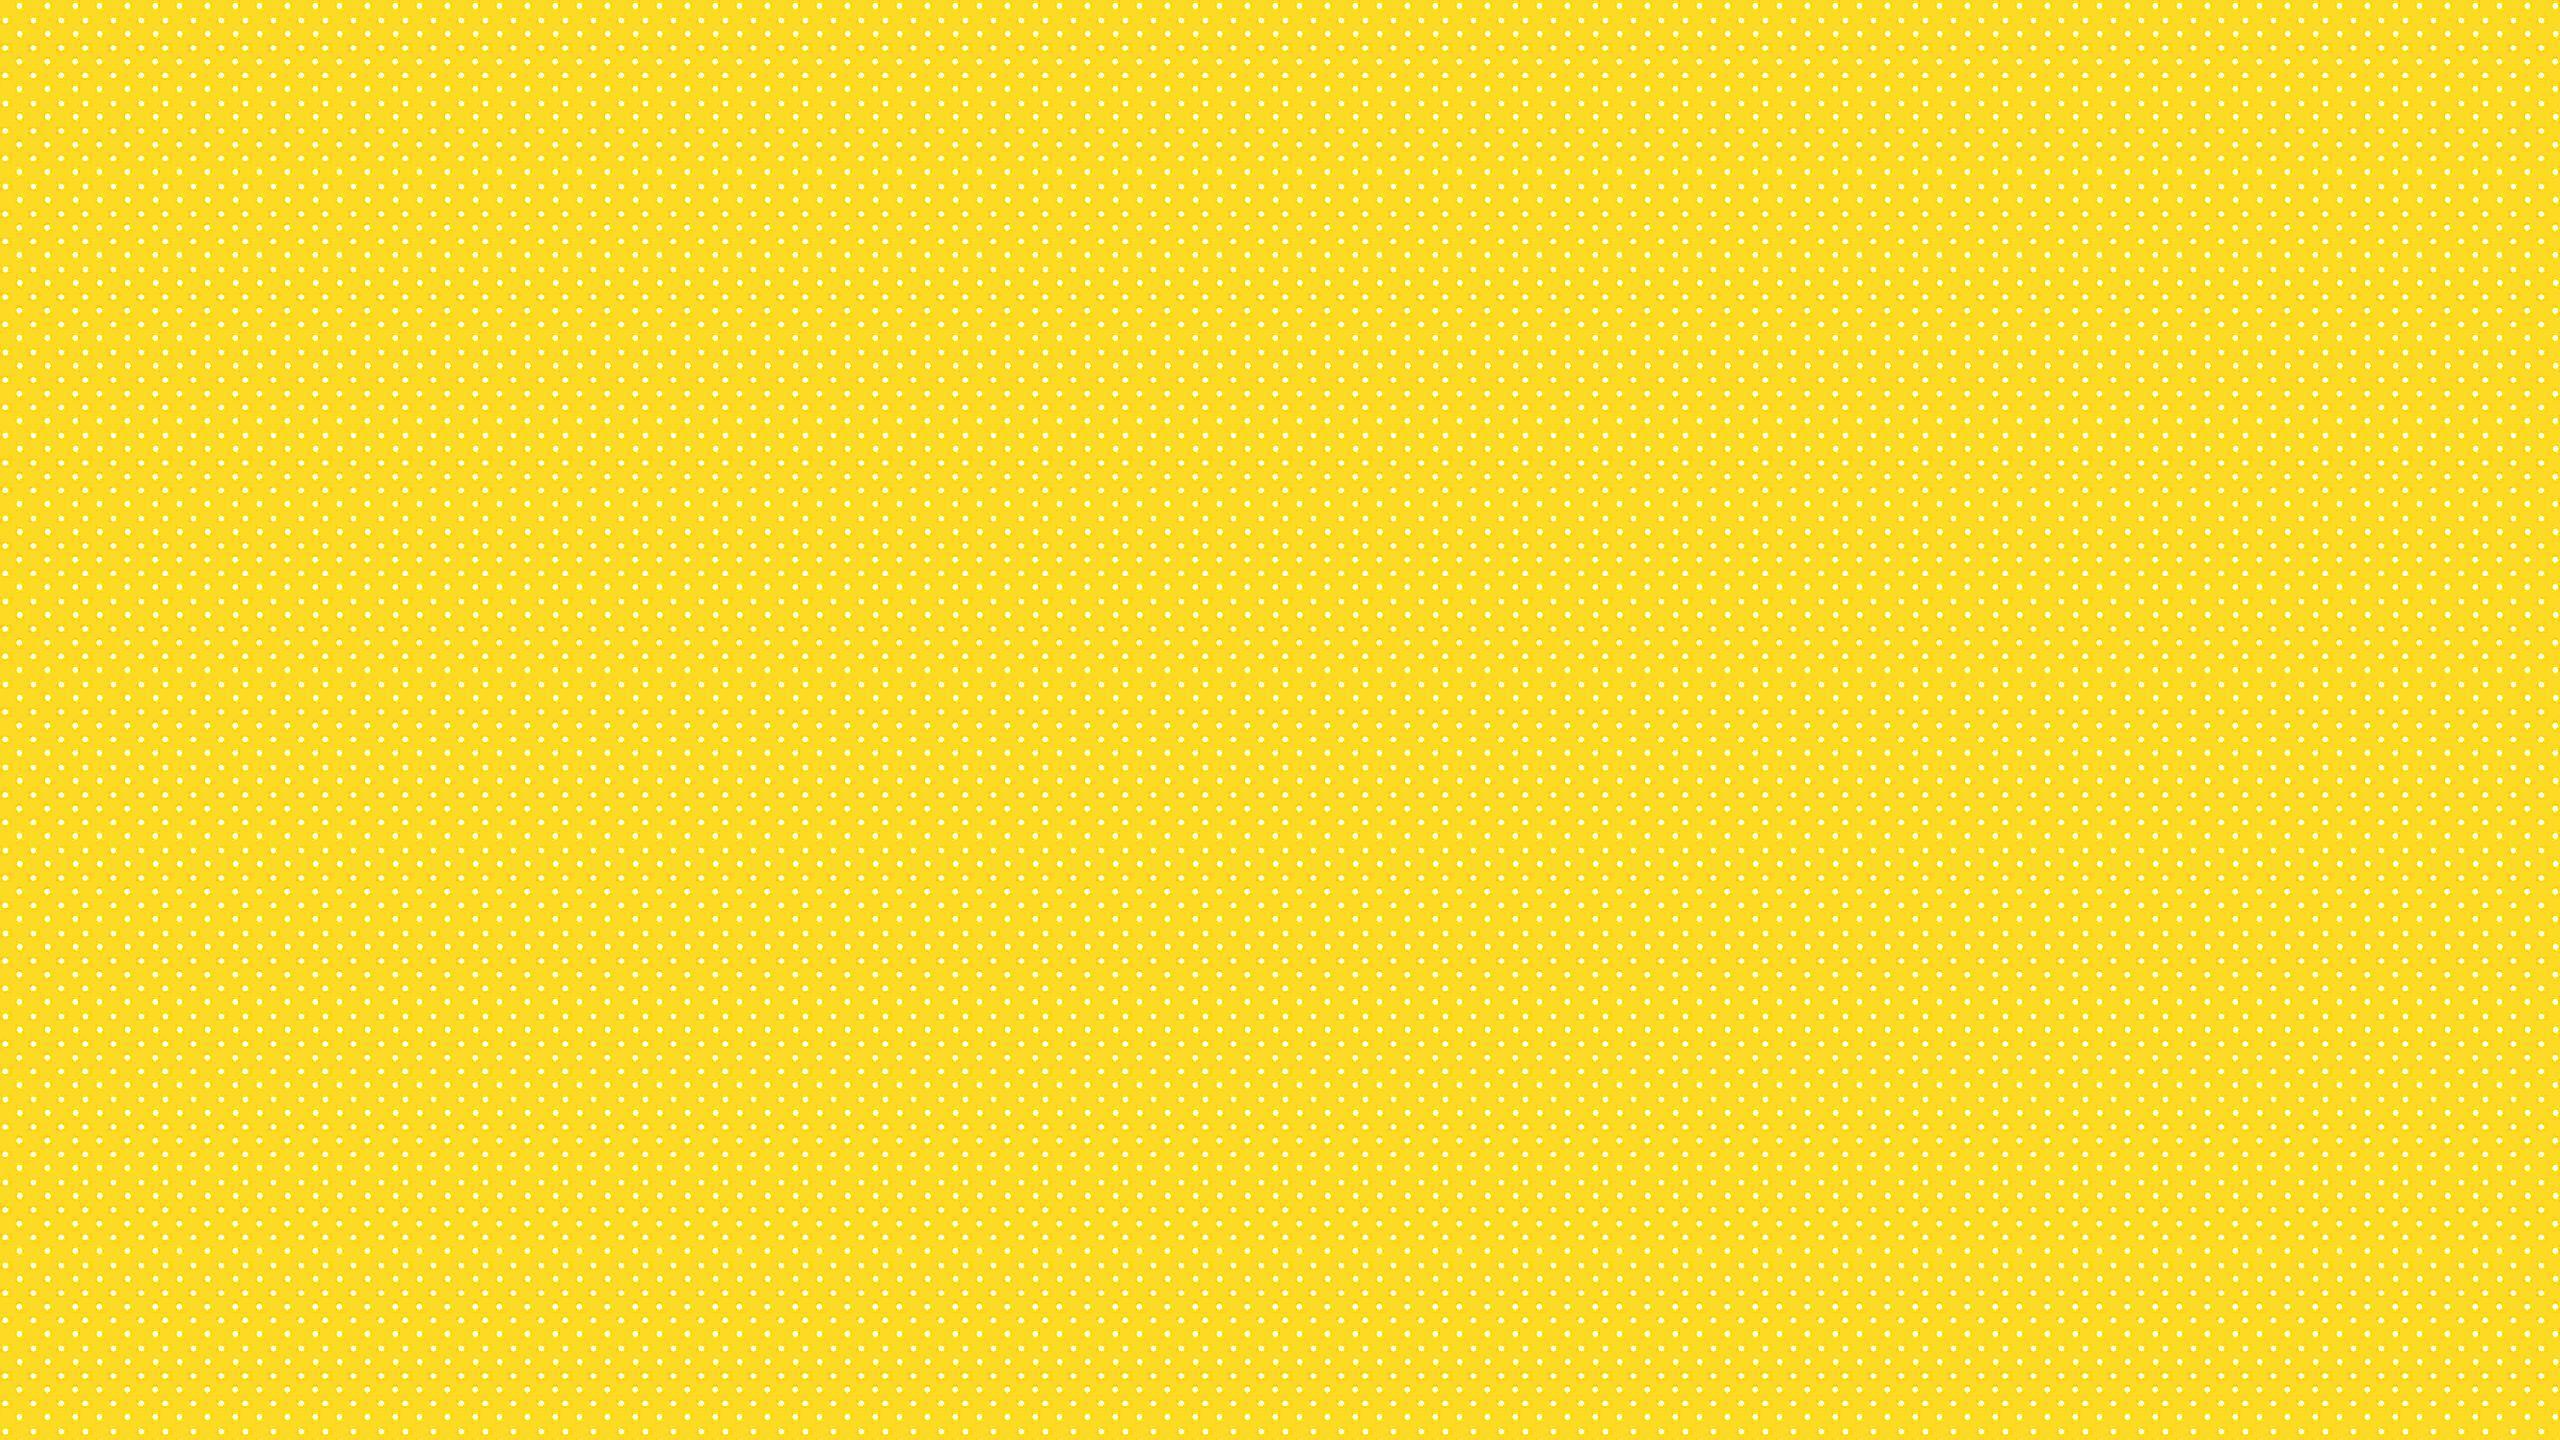 Yellow Popular Aesthetic Background Landscape | Dedemax